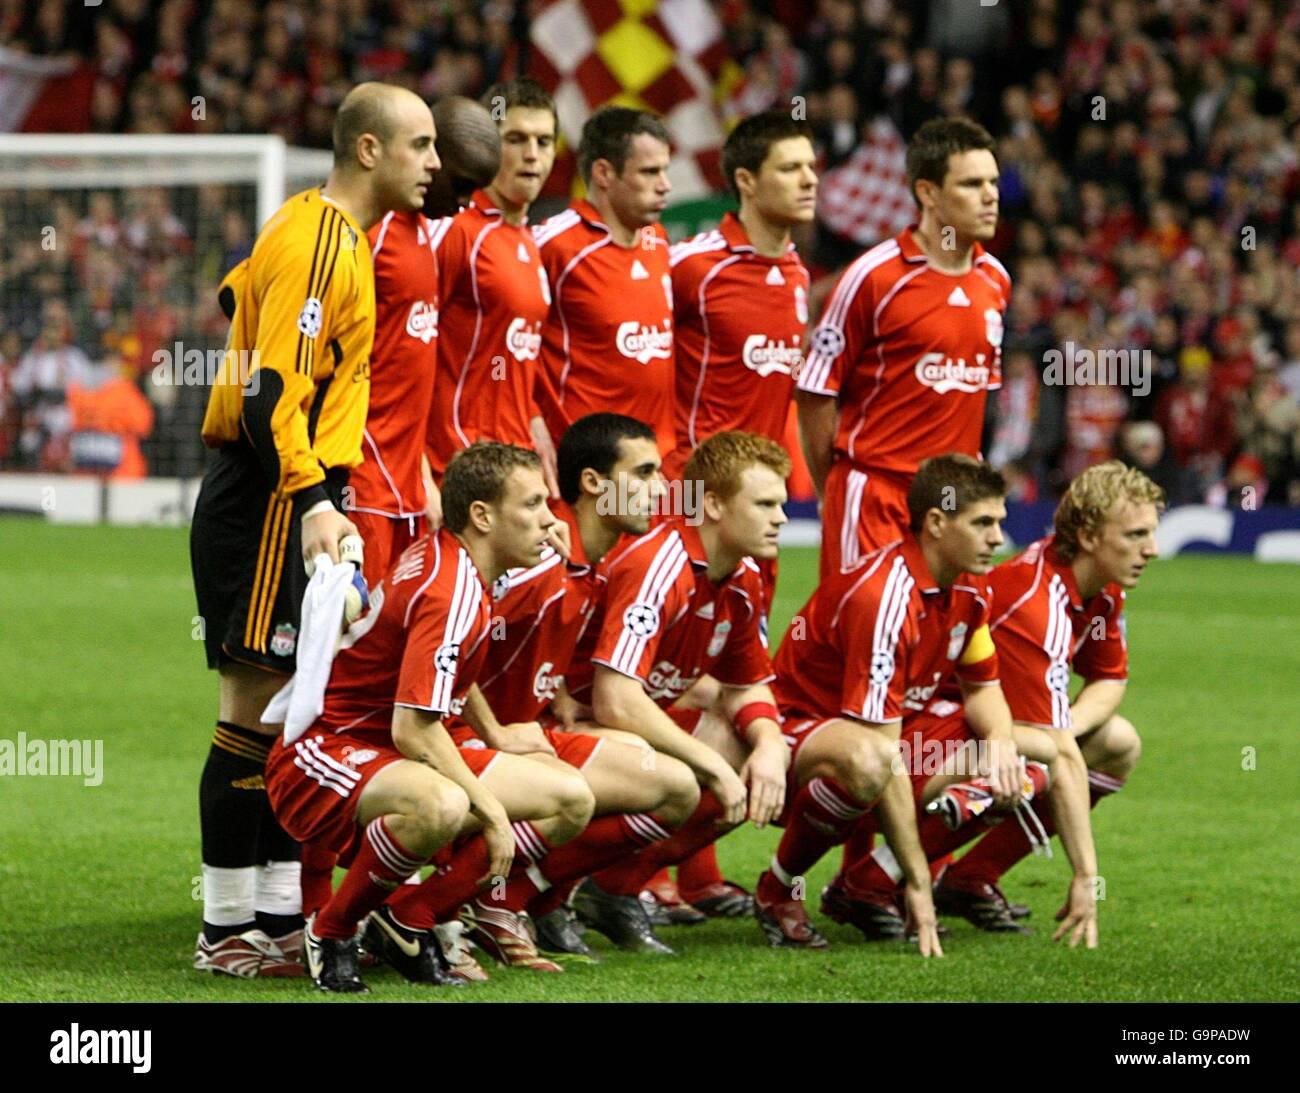 Liverpool Fc 4 0 Barcelona International Champions Cup: Fc Barcelona Team Group Line Up Stockfotos & Fc Barcelona